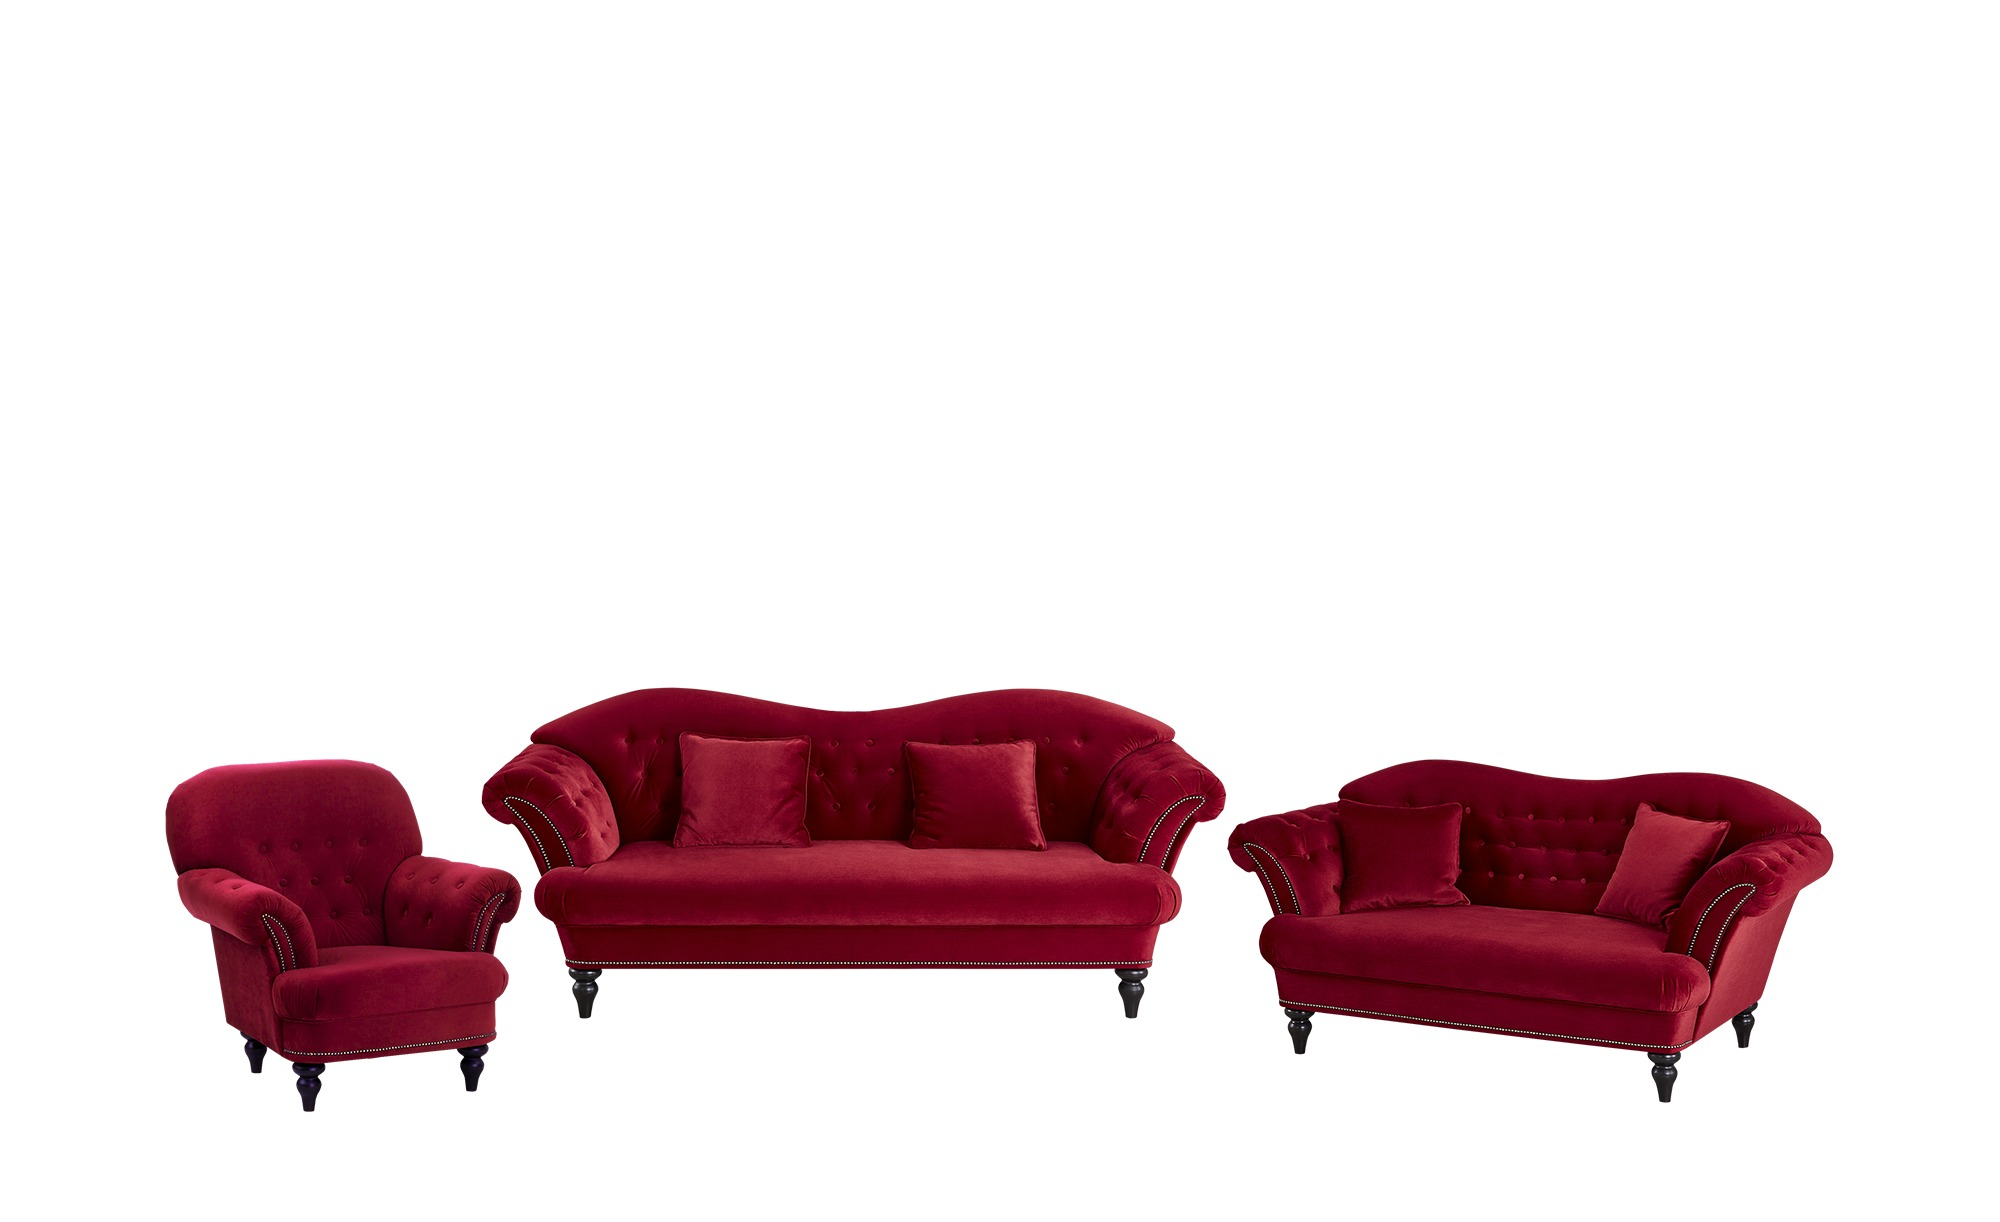 Full Size of Sofa Garnitur 2 Teilig Sitzgruppe 3 Sissi Mbel Hffner Blaues Heimkino Riess Ambiente Rattan U Form Xxl Bett 120 Cm Breit Massivholz 180x200 Arten Recamiere Sofa Sofa Garnitur 2 Teilig